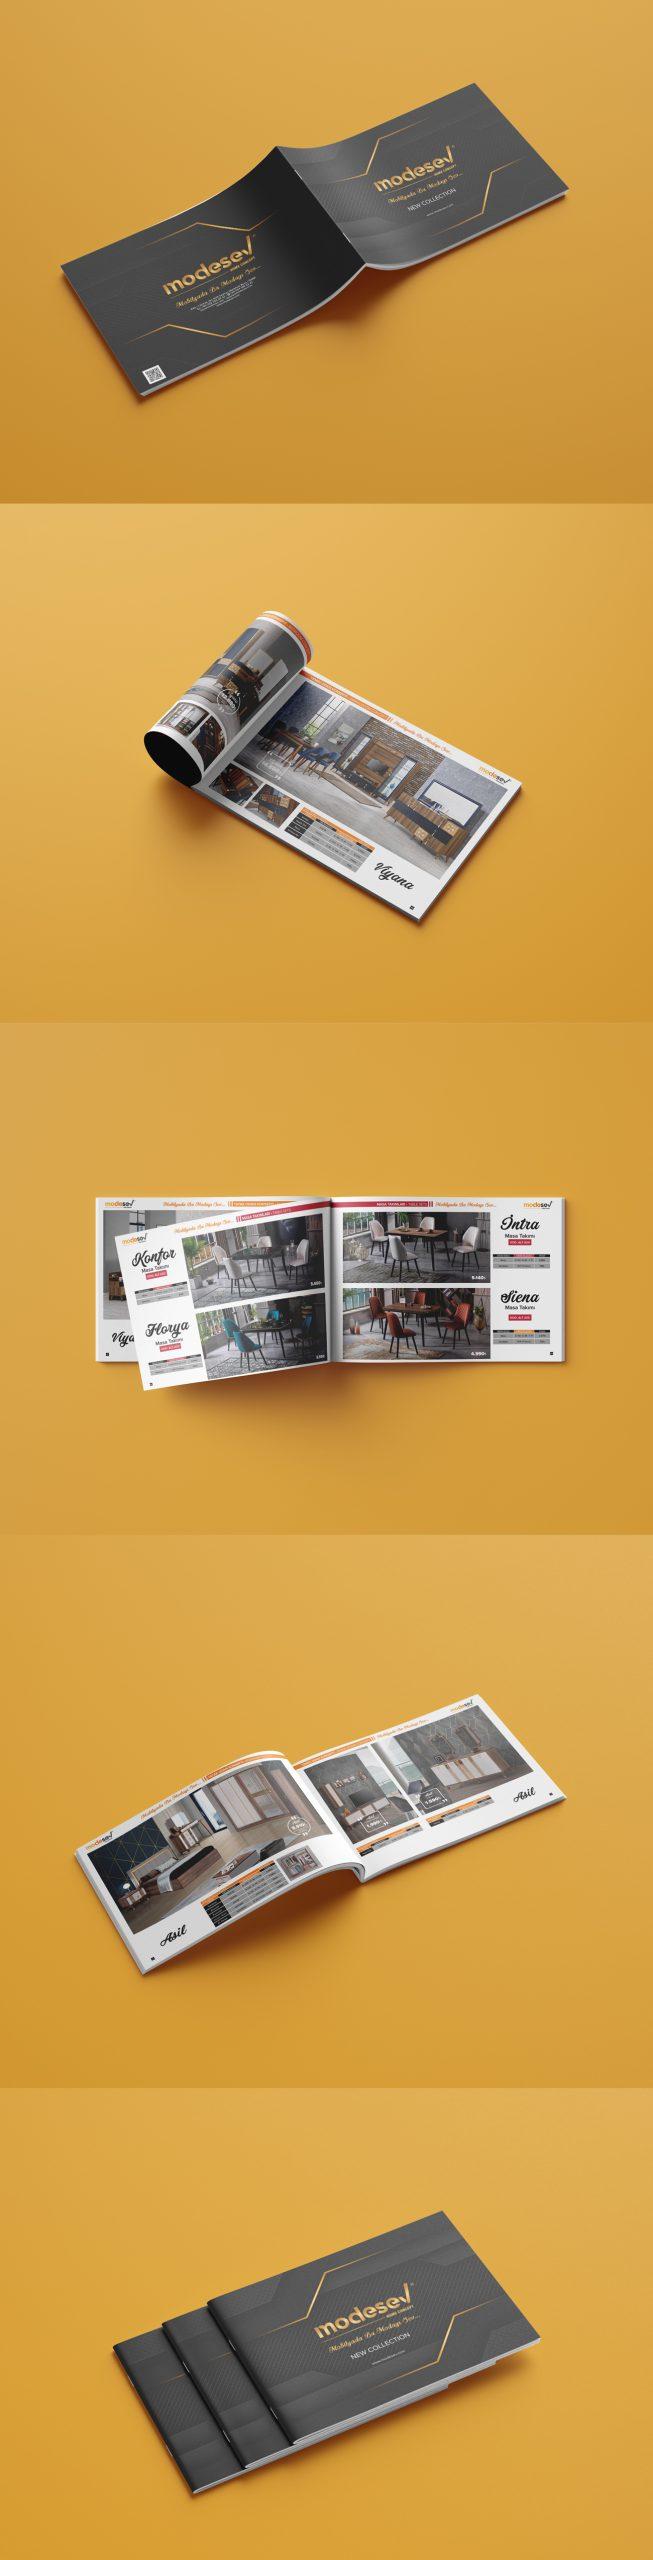 modesev-katalog-tasarim-tasarim